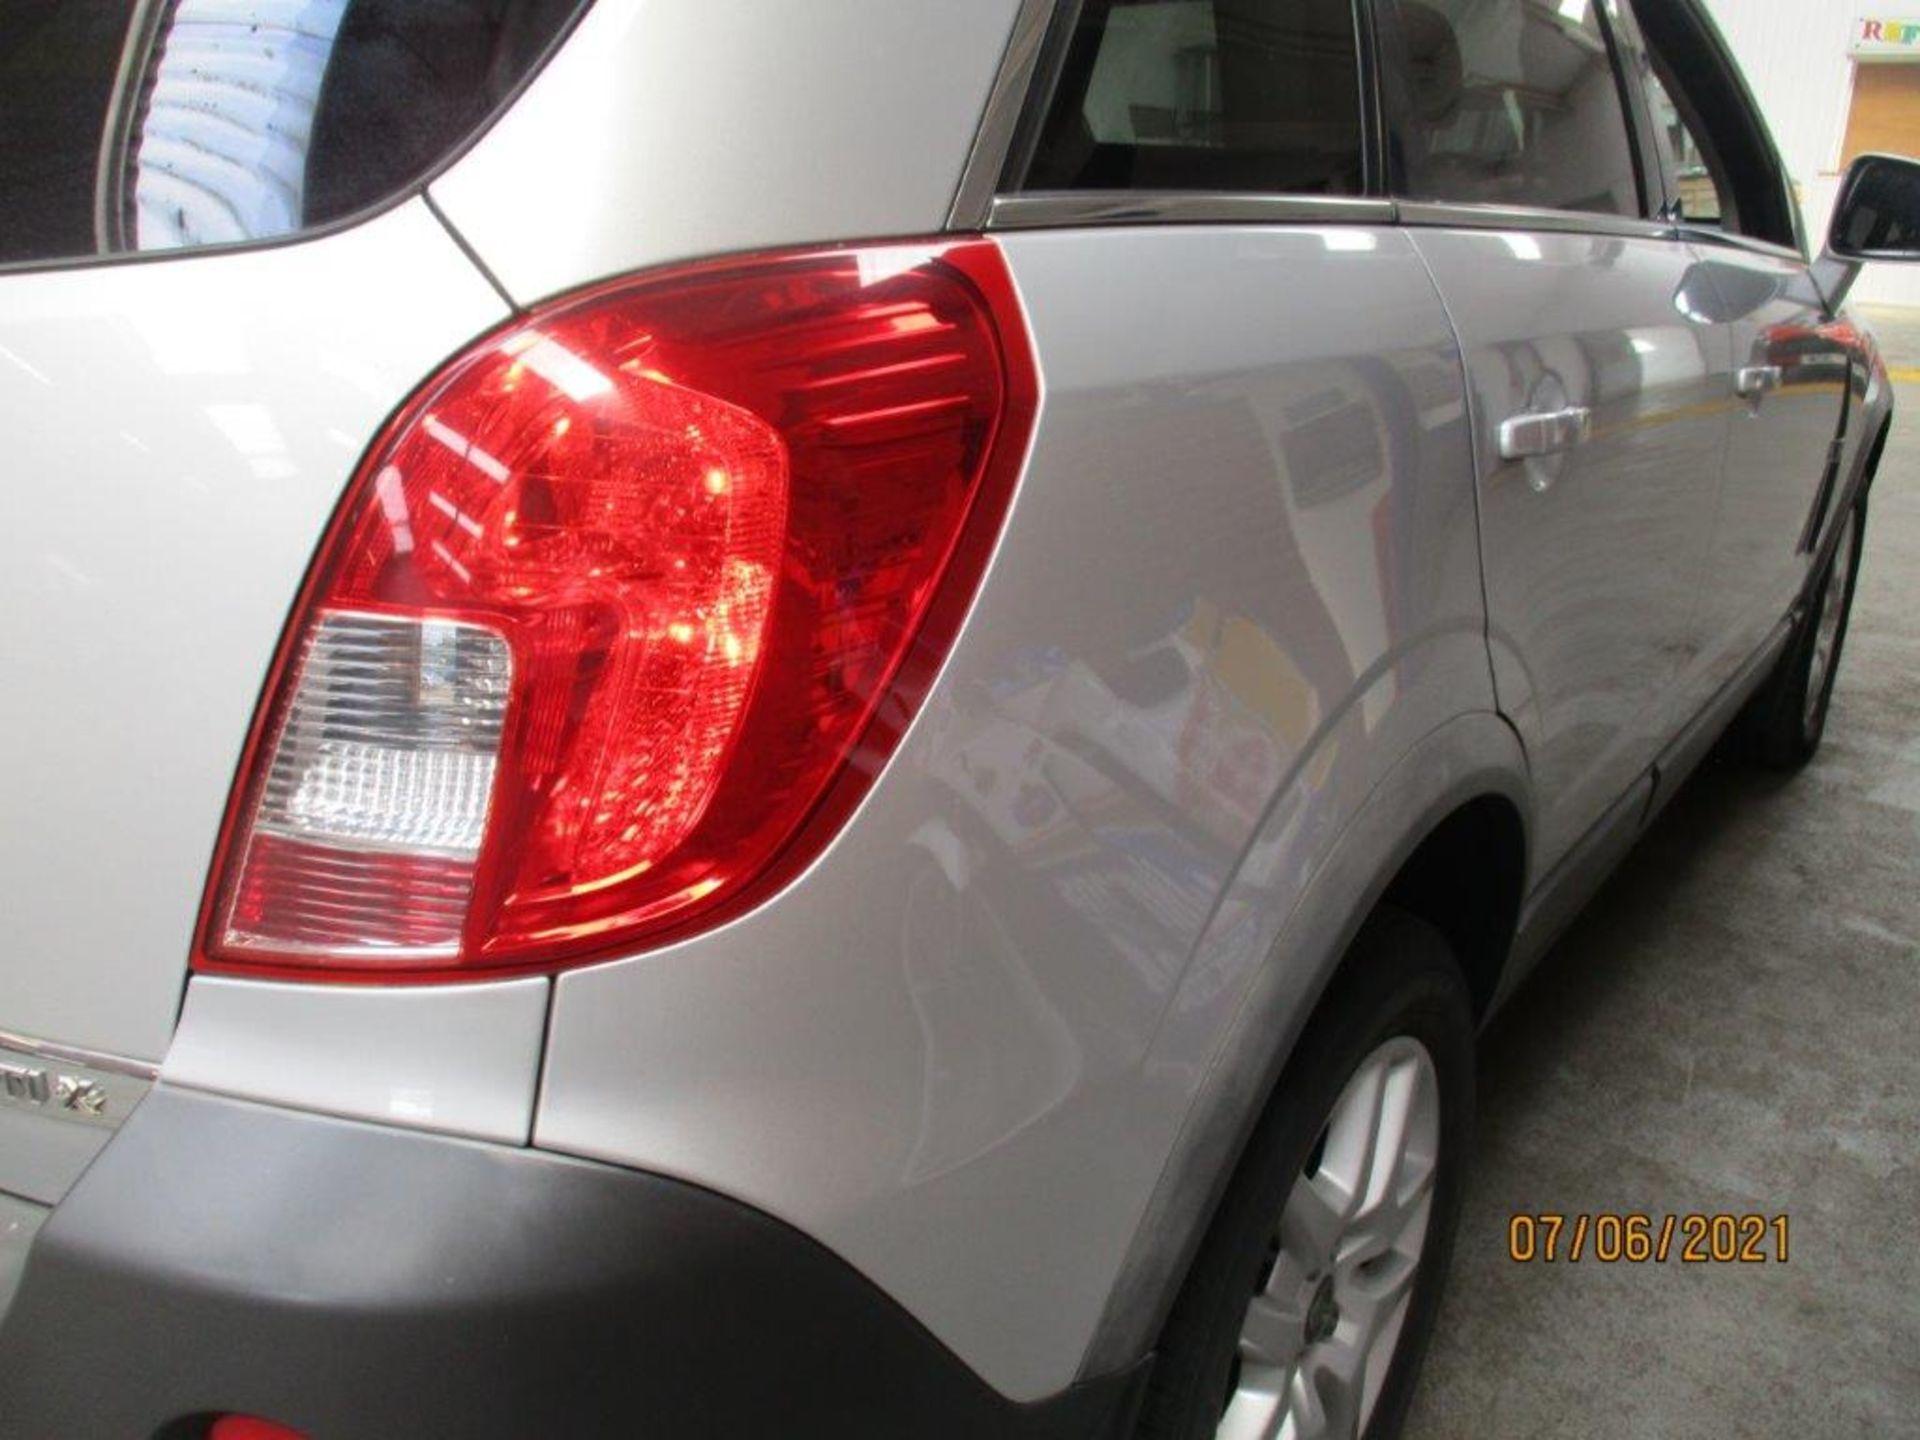 12 12 Vauxhall Antara Excl CDTI - Image 8 of 18